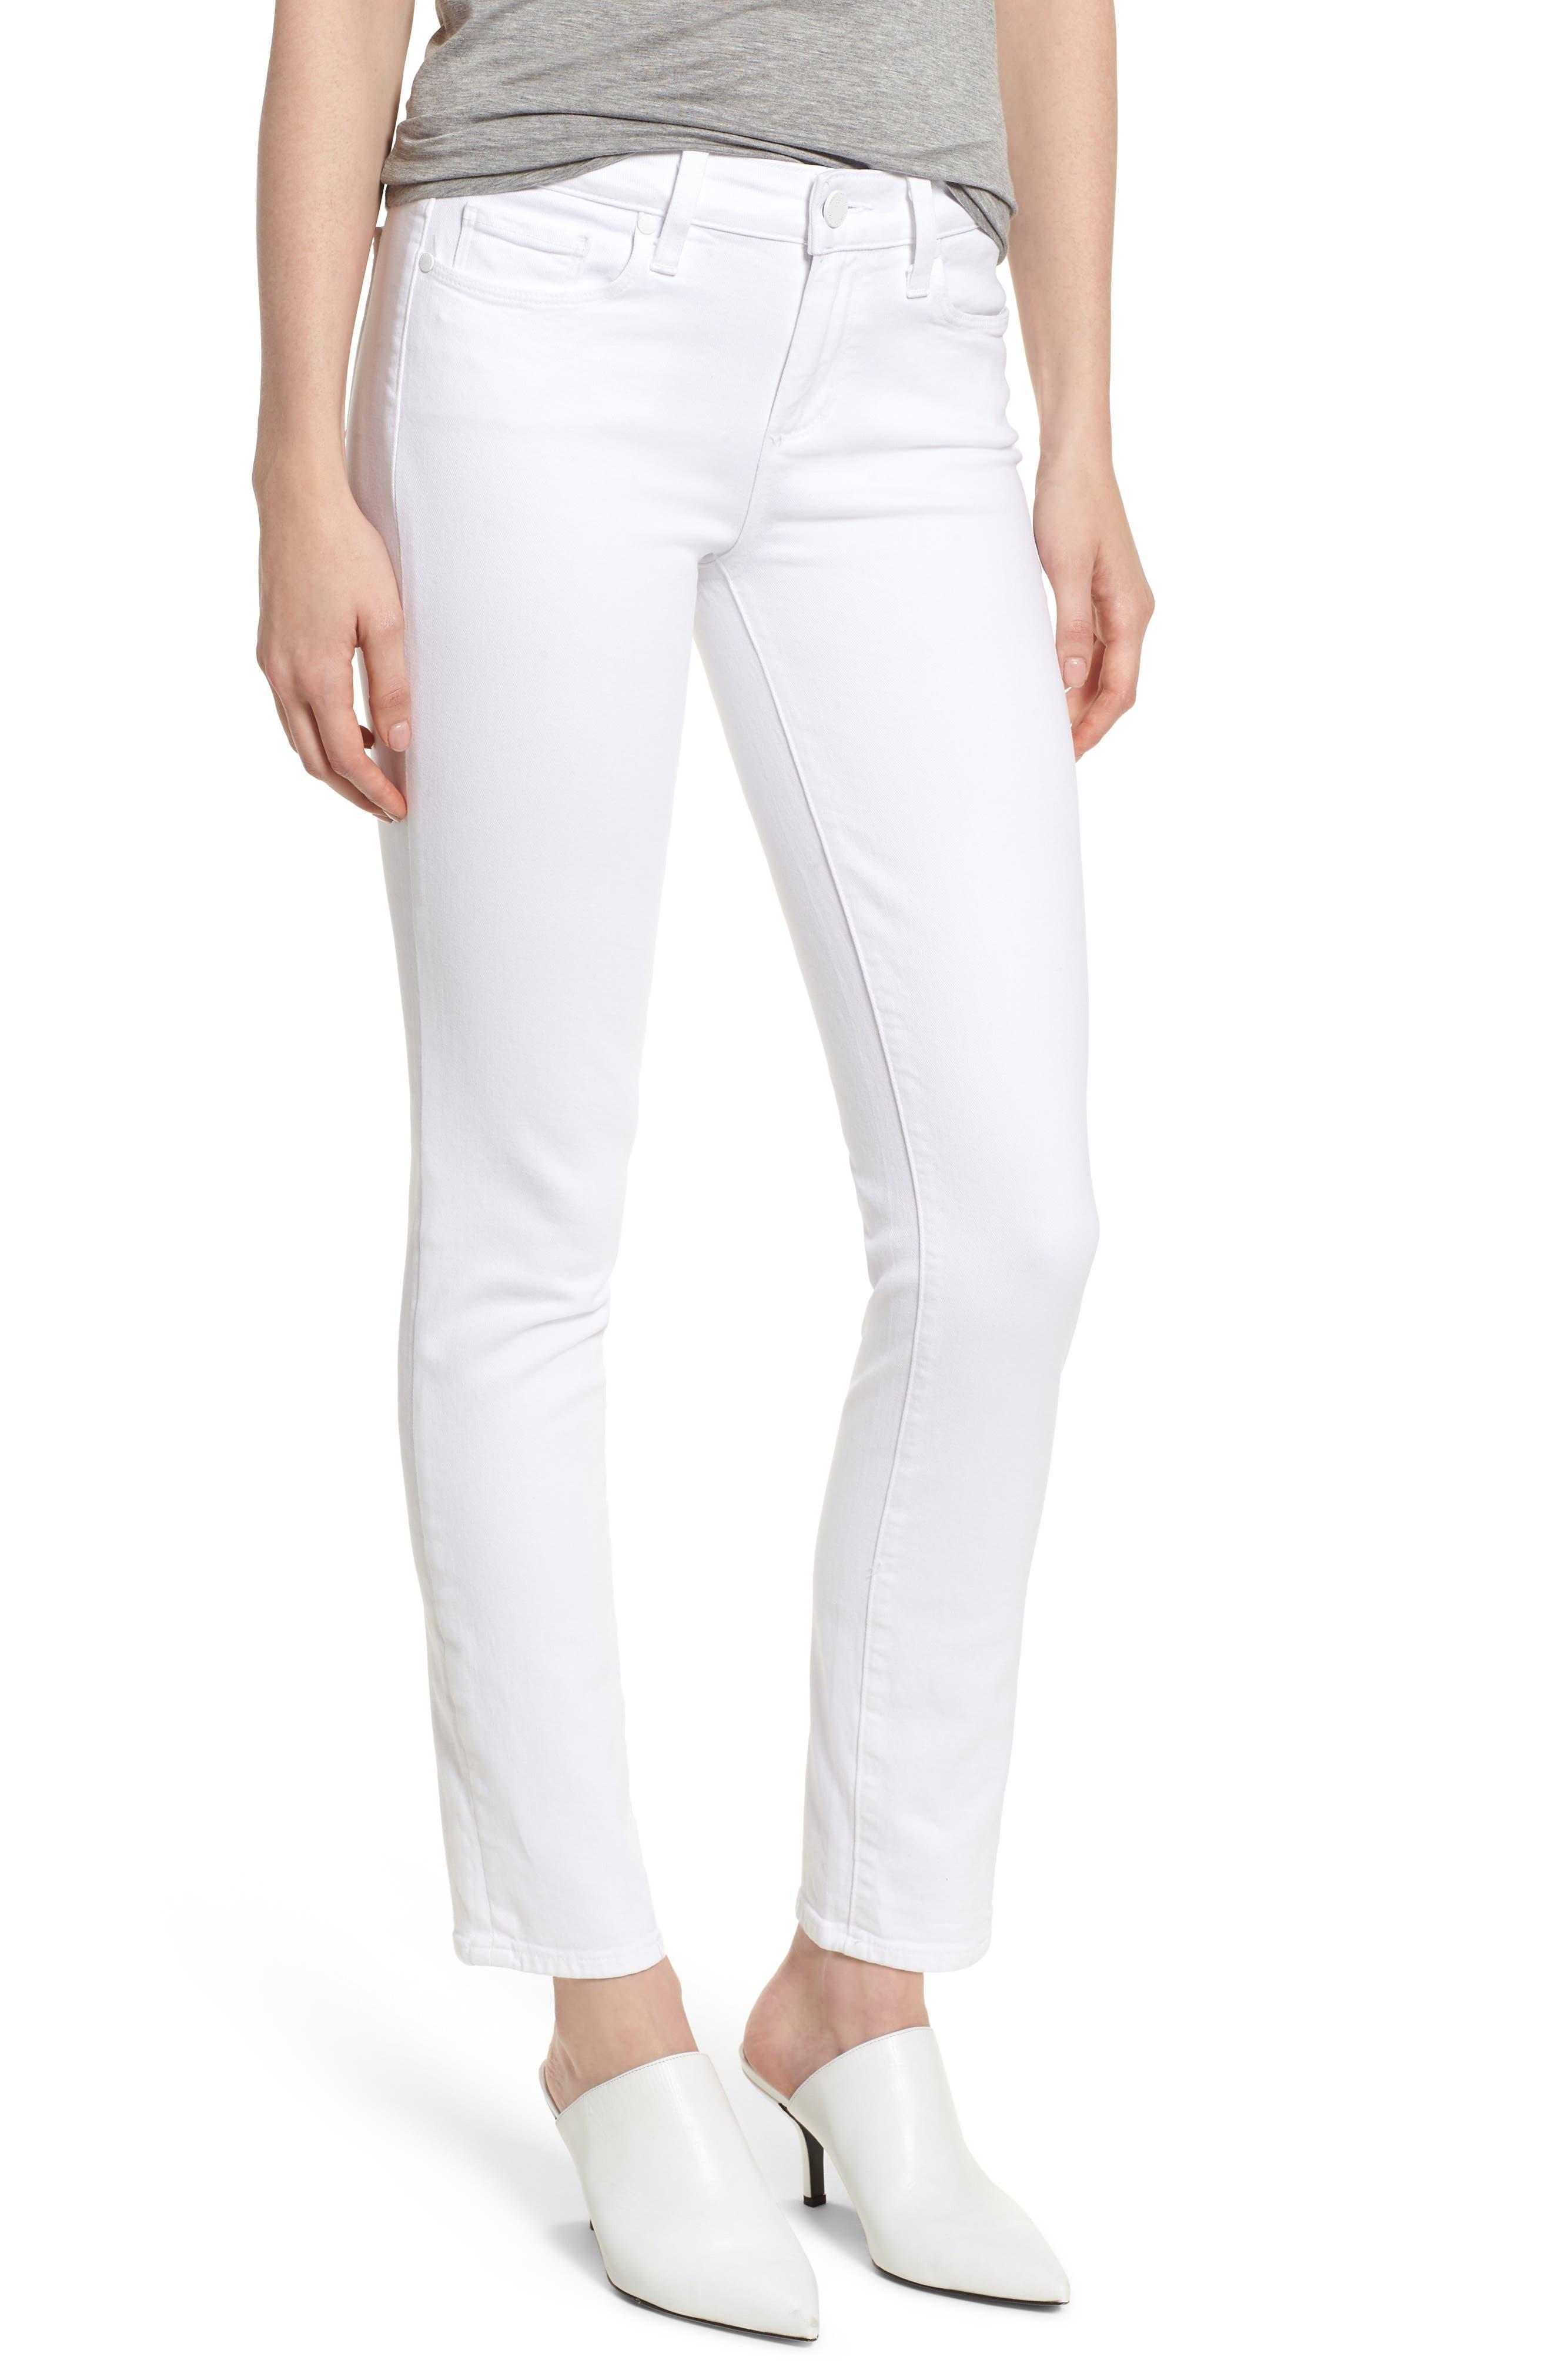 Skyline Ankle Peg Skinny Jeans,                         Main,                         color, Crisp White